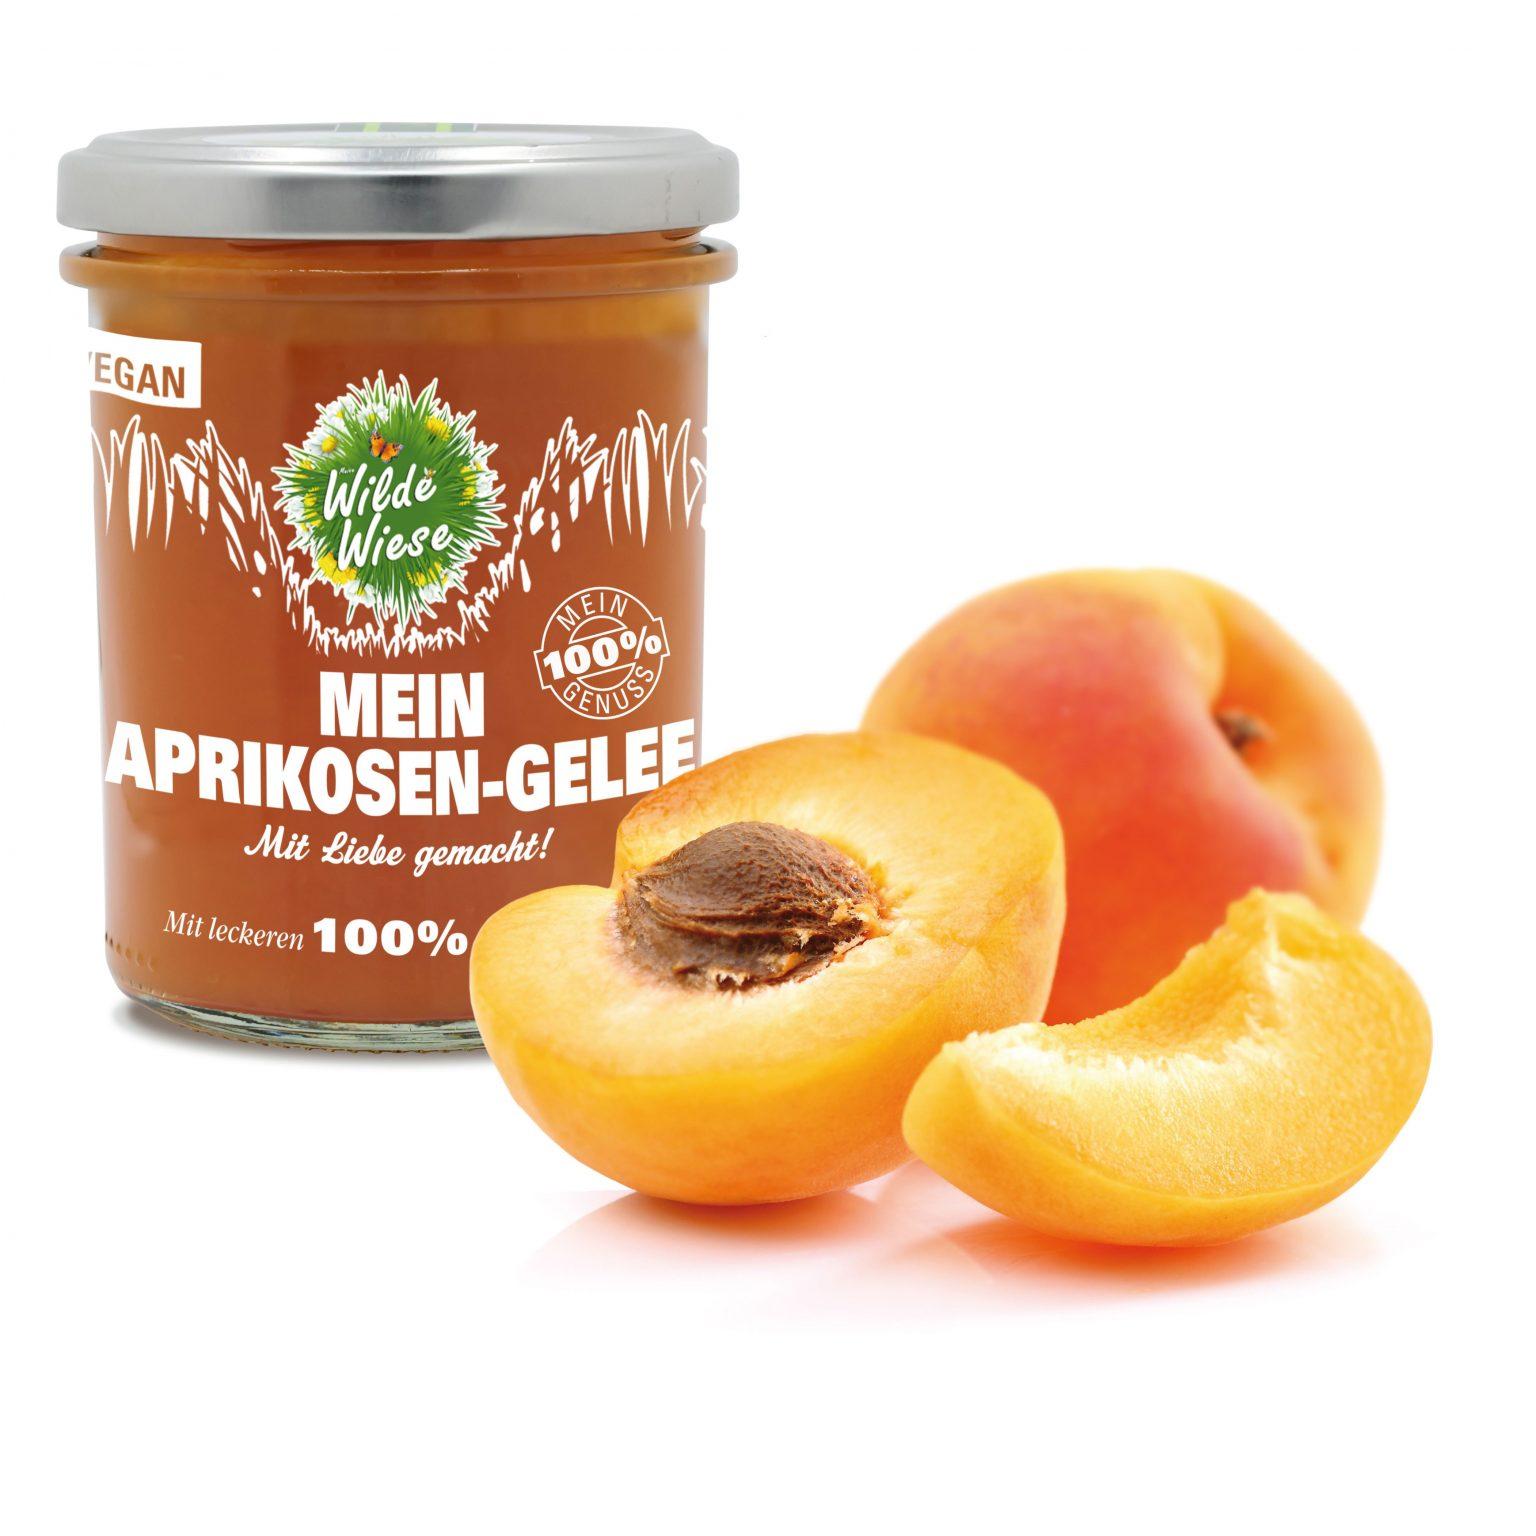 Wilde Wiese Mein Aprikosen Gelee - 100% Aprikosensaft - Vegan